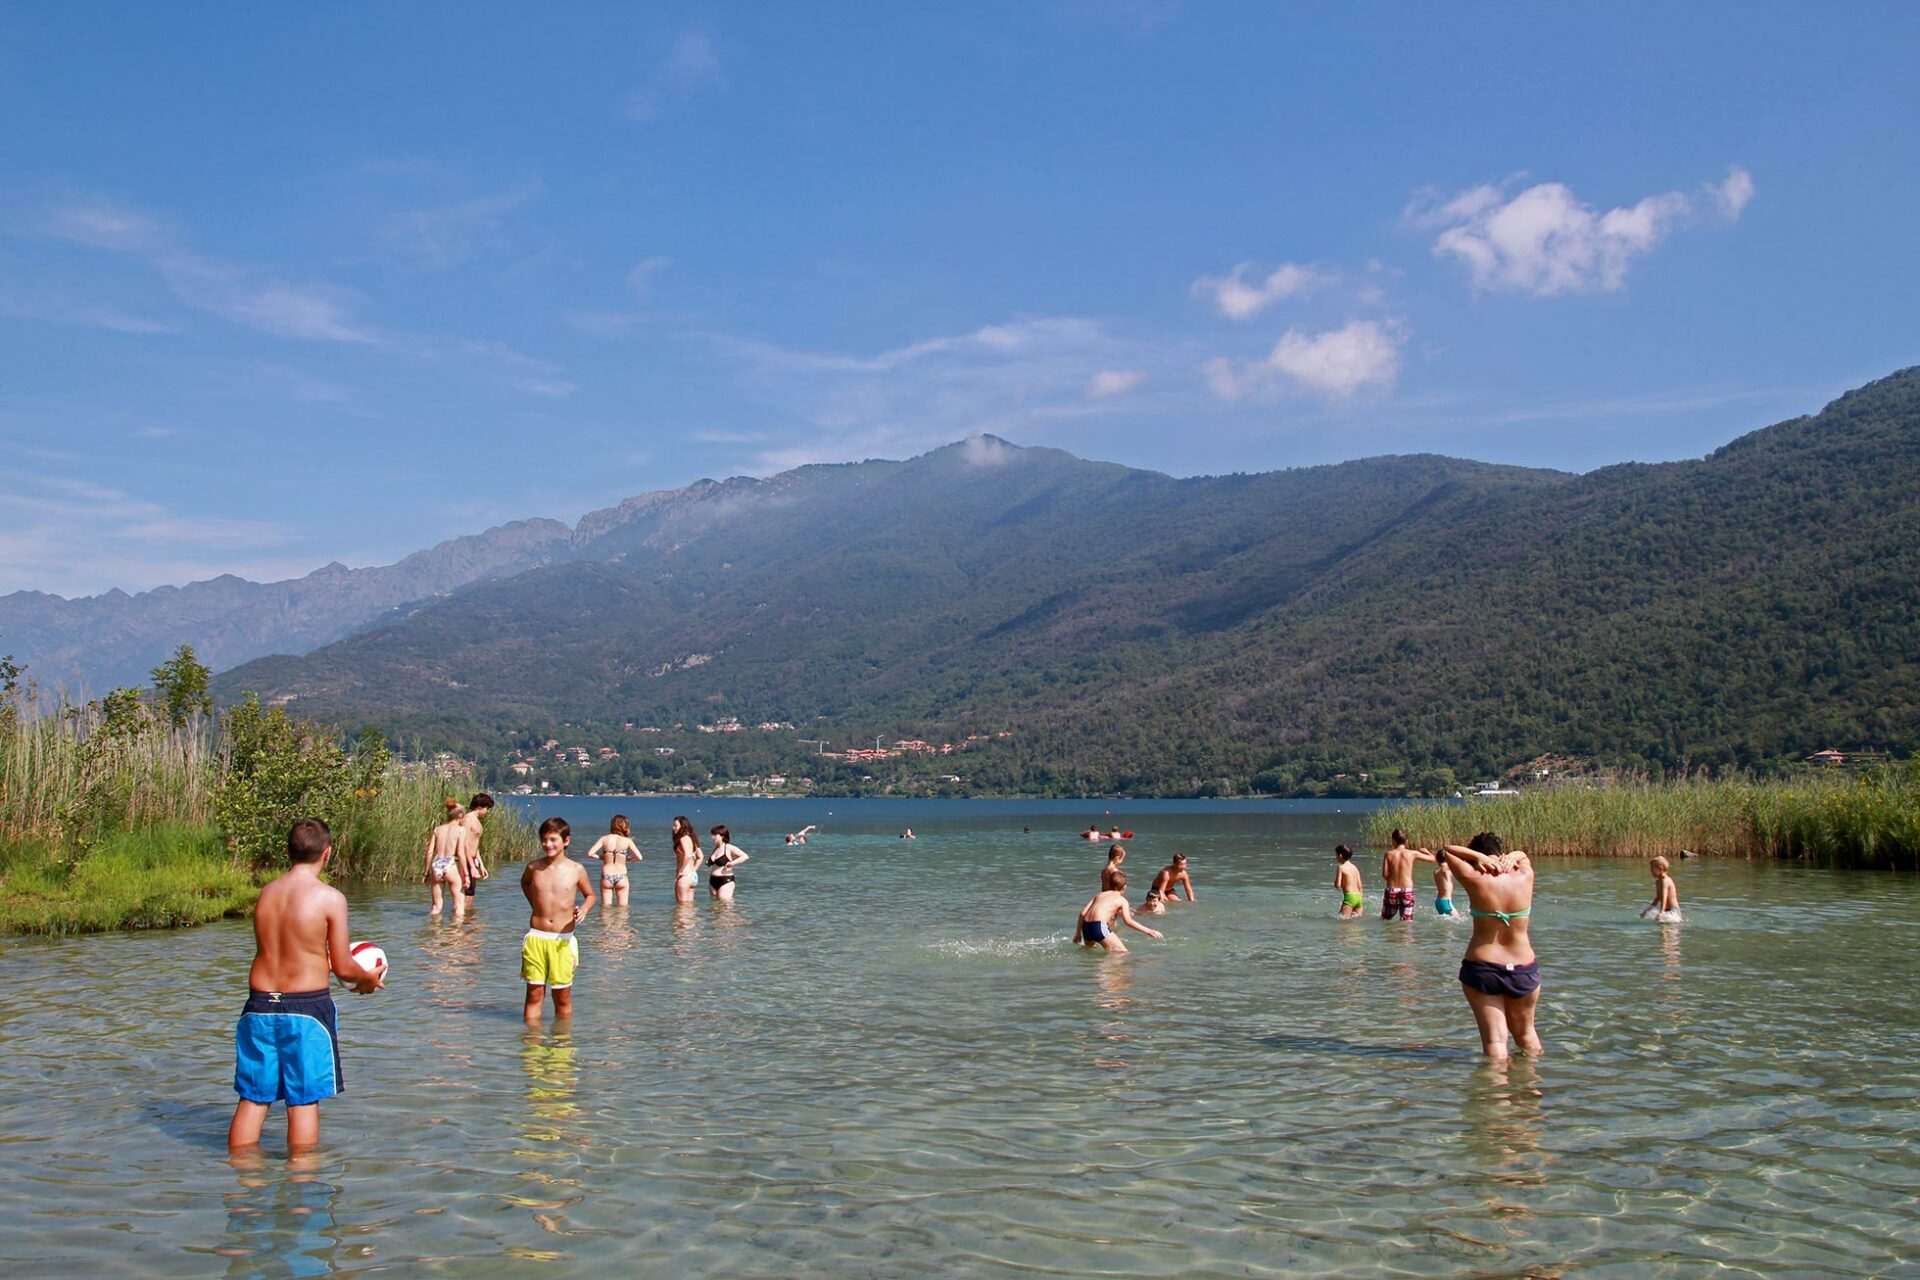 Warm duschen - kalt baden: Kneippkur am Lago Mergozzo